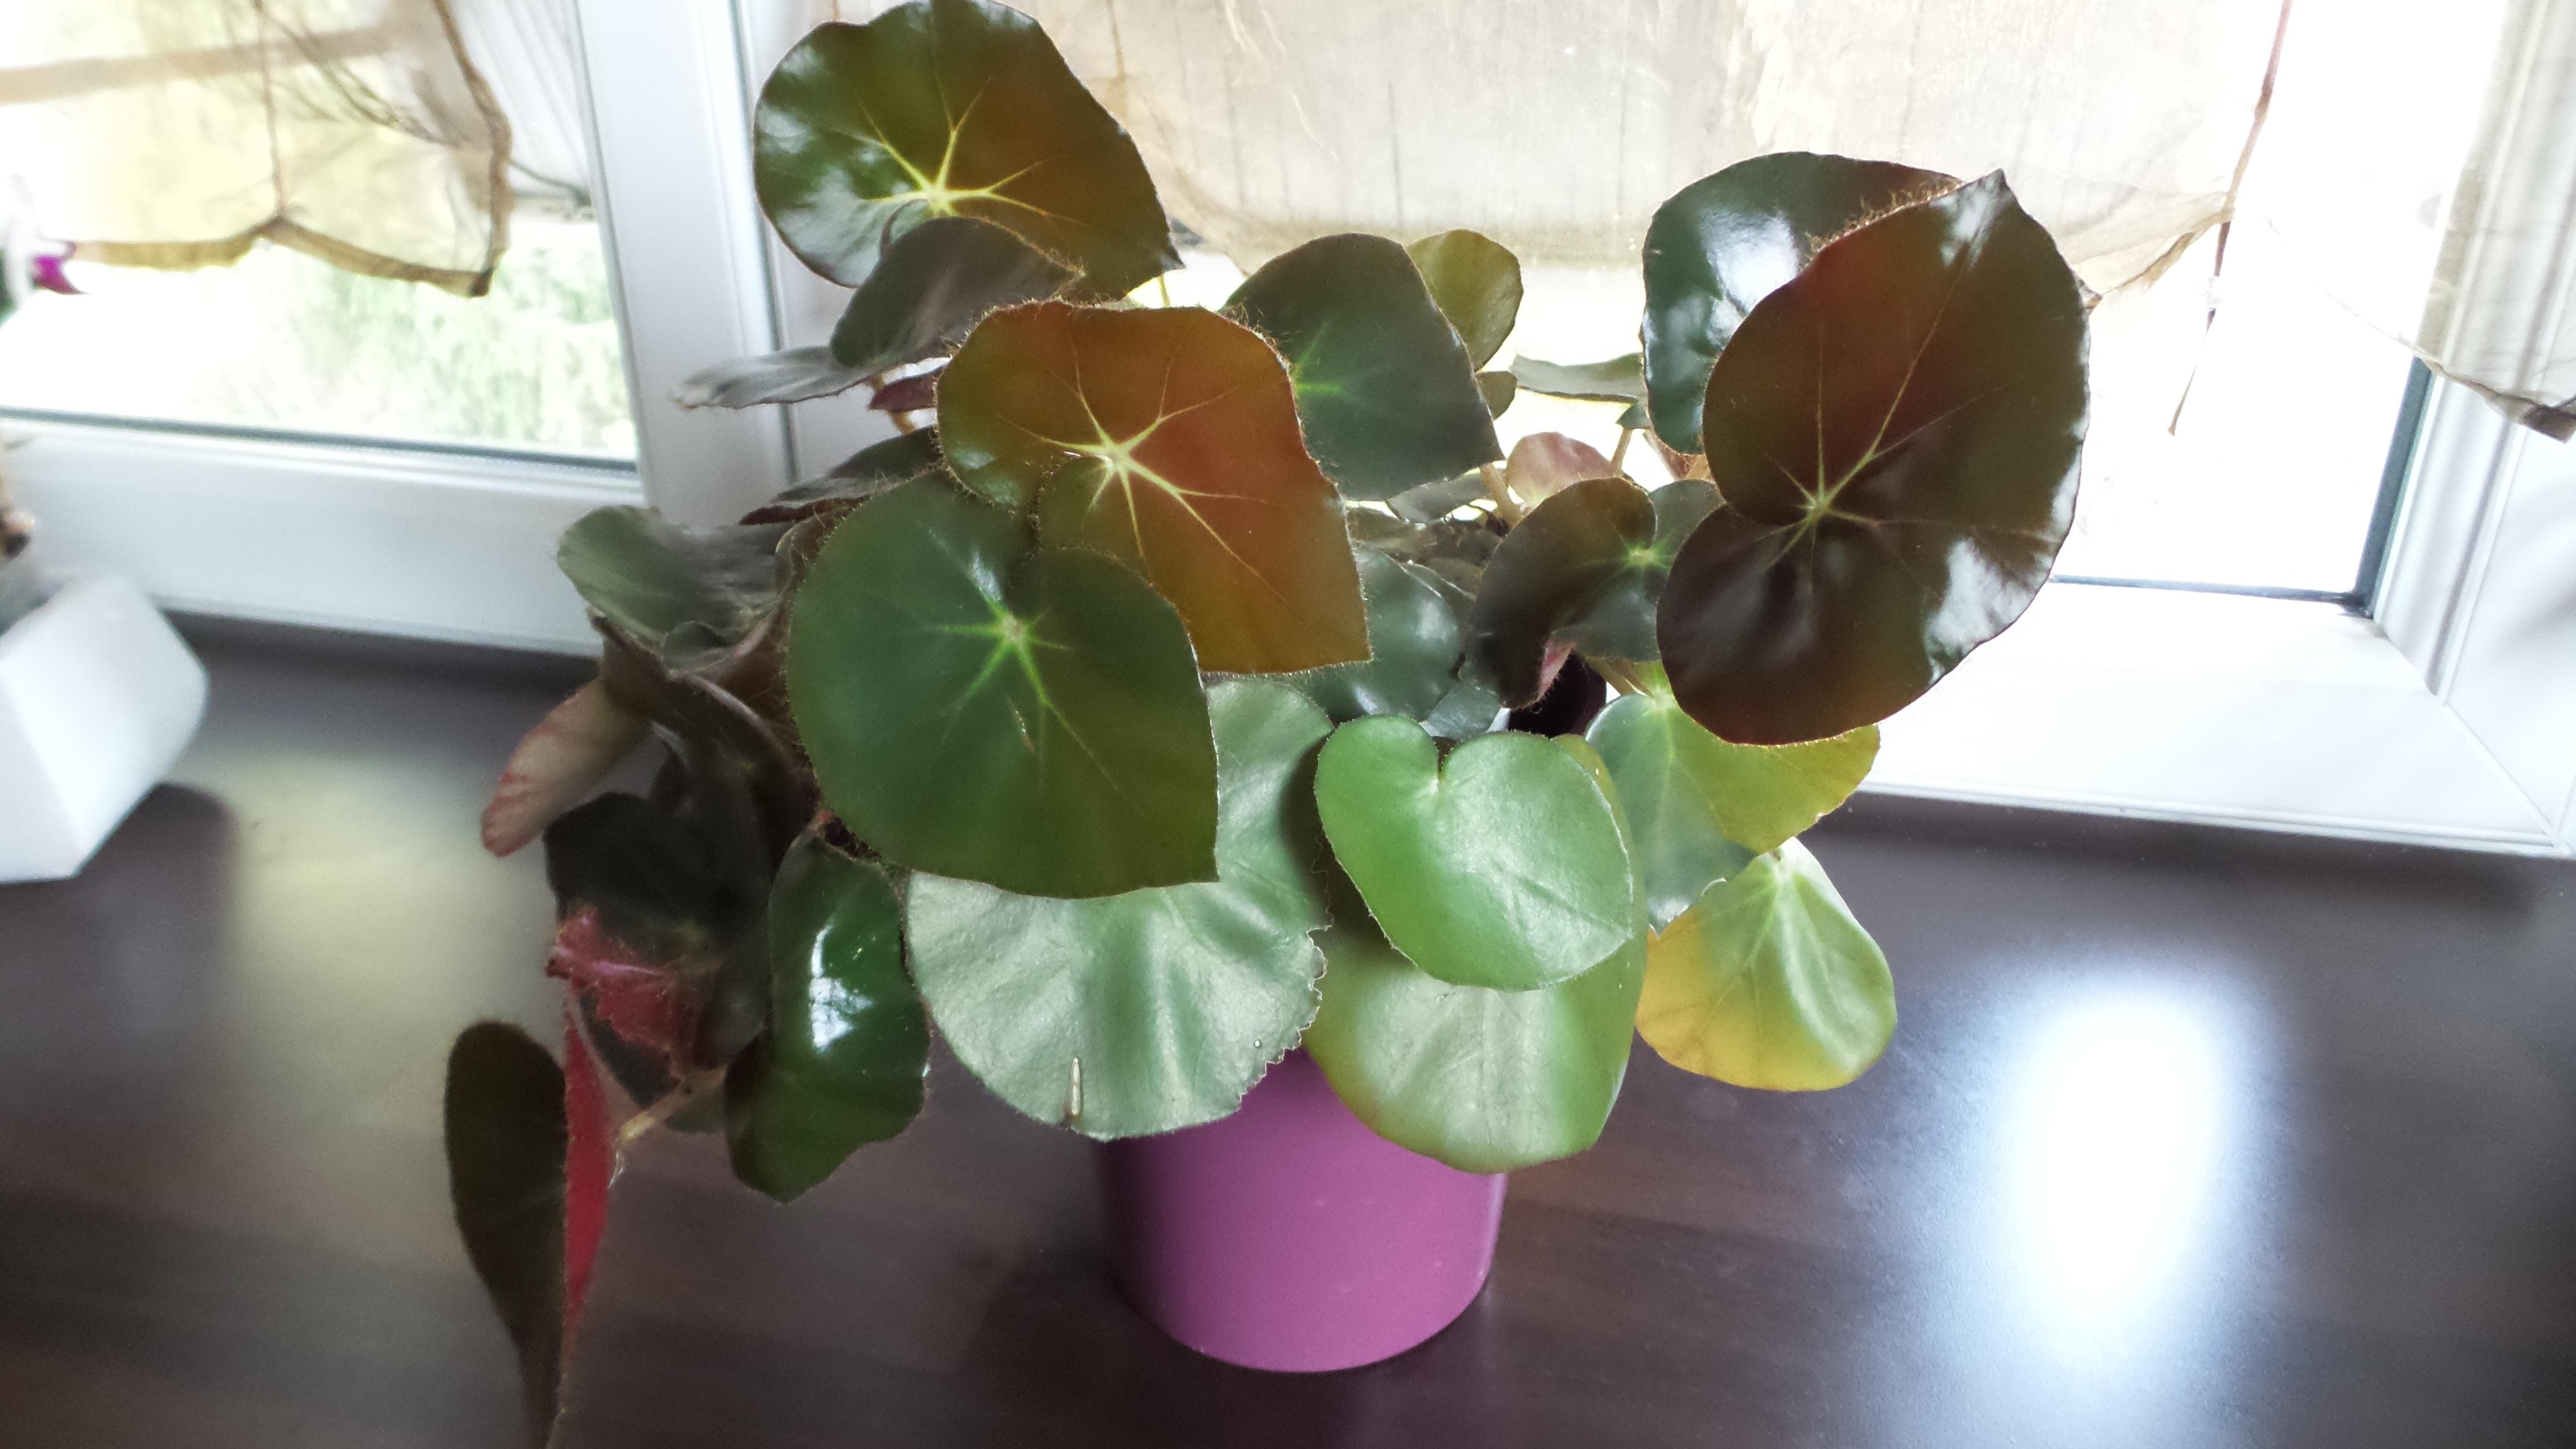 bégonias nénuphar - Begonia 'Erythrophylla'  - Page 2 39327120160701191503